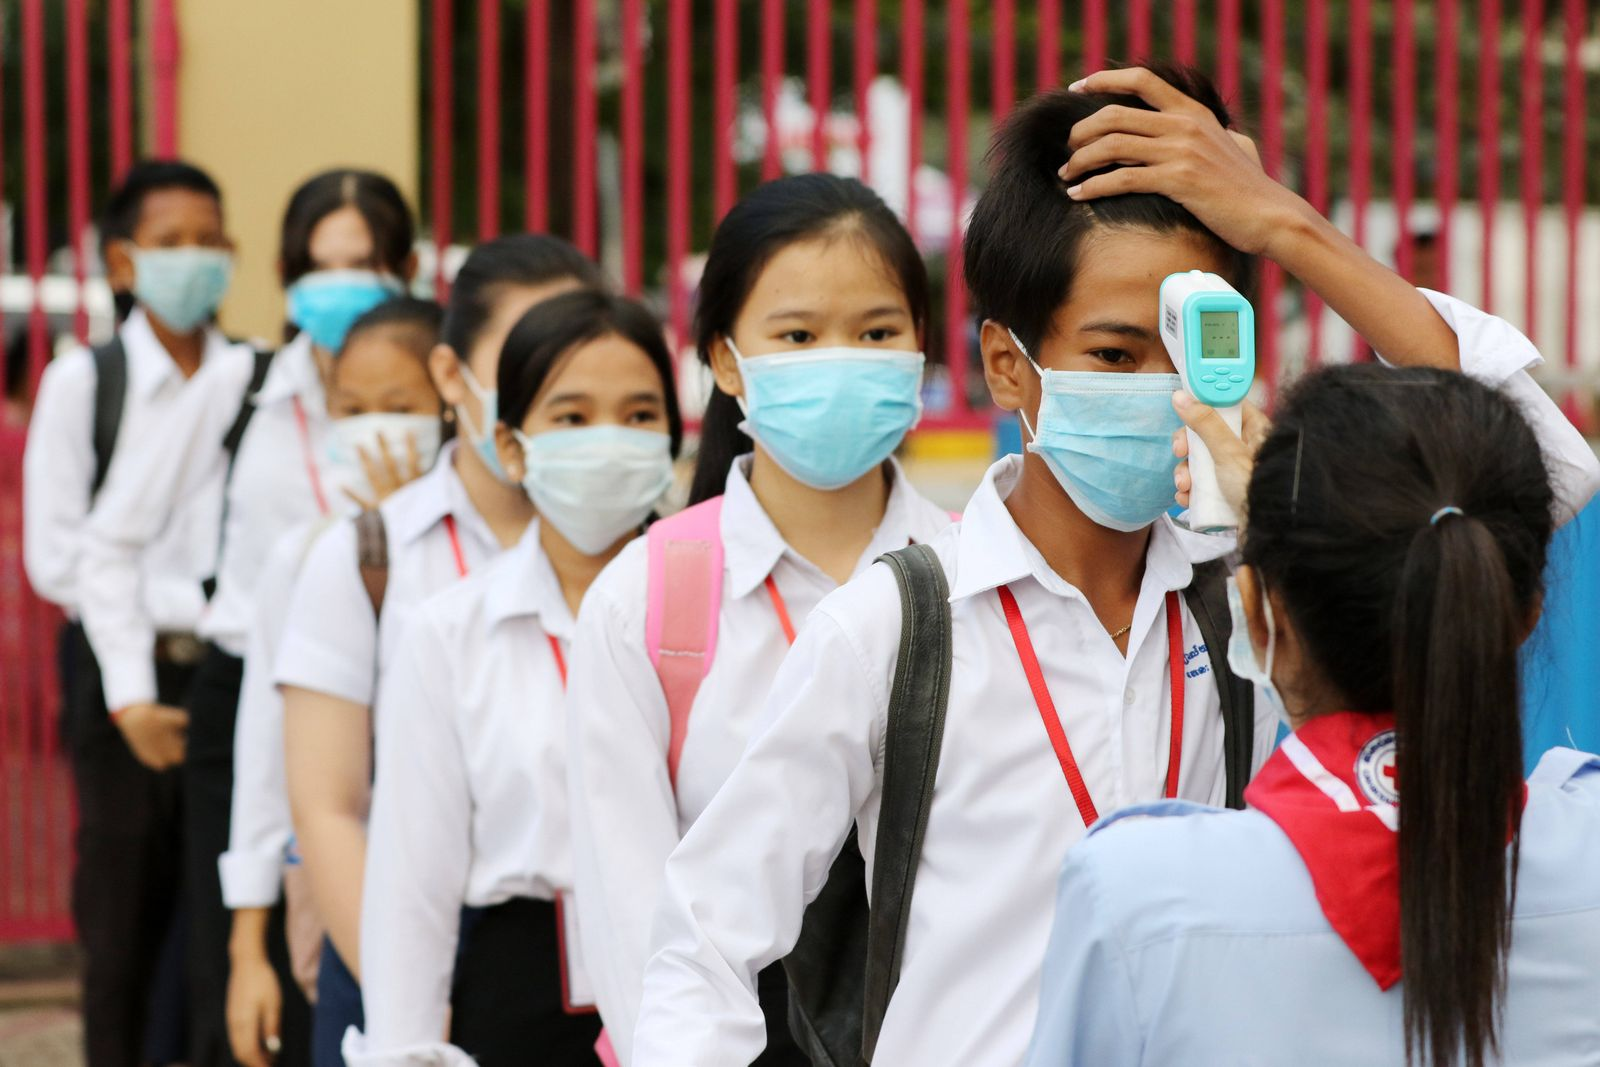 (200907) -- PHNOM PENH, Sept. 7, 2020 -- Students queue for body temperature screening at the Bak Touk High School in Ph